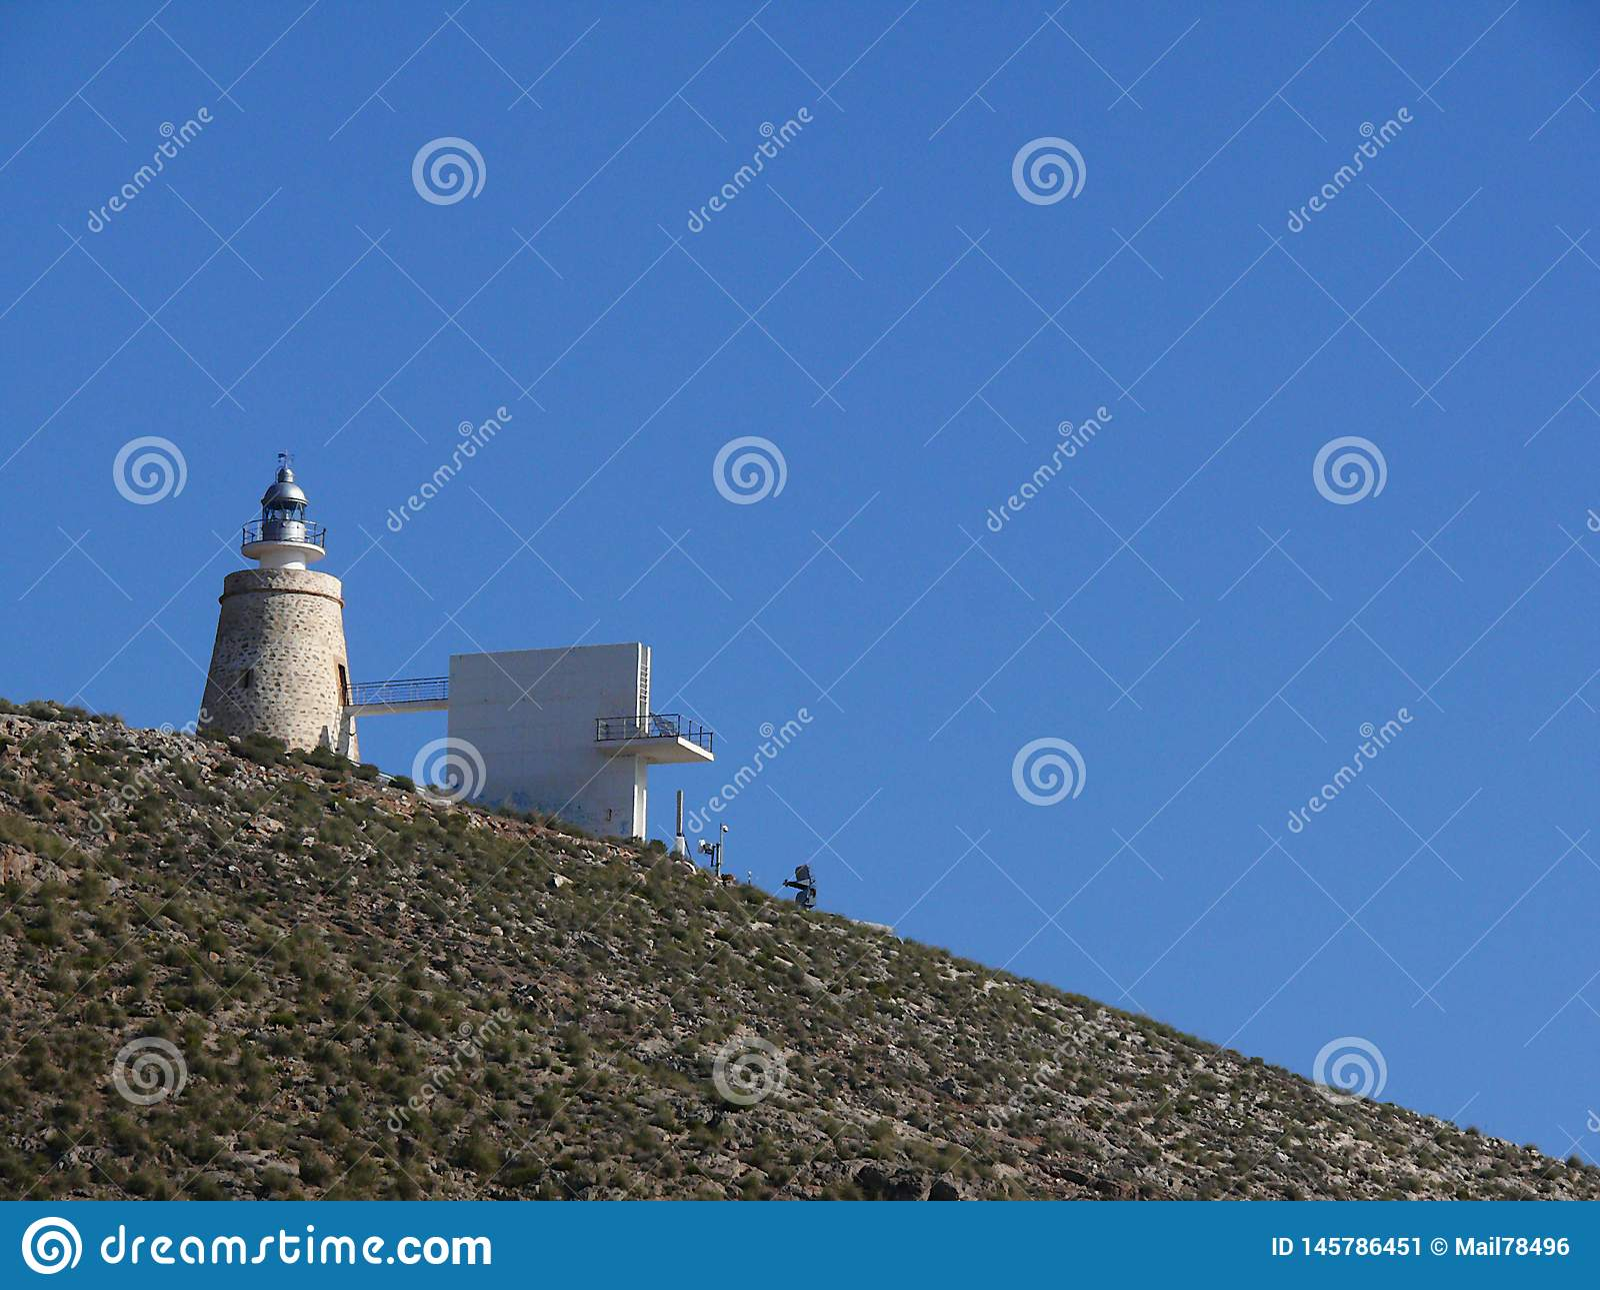 Андалусия, Испания 12/31/2006 Старый маяк на холмах